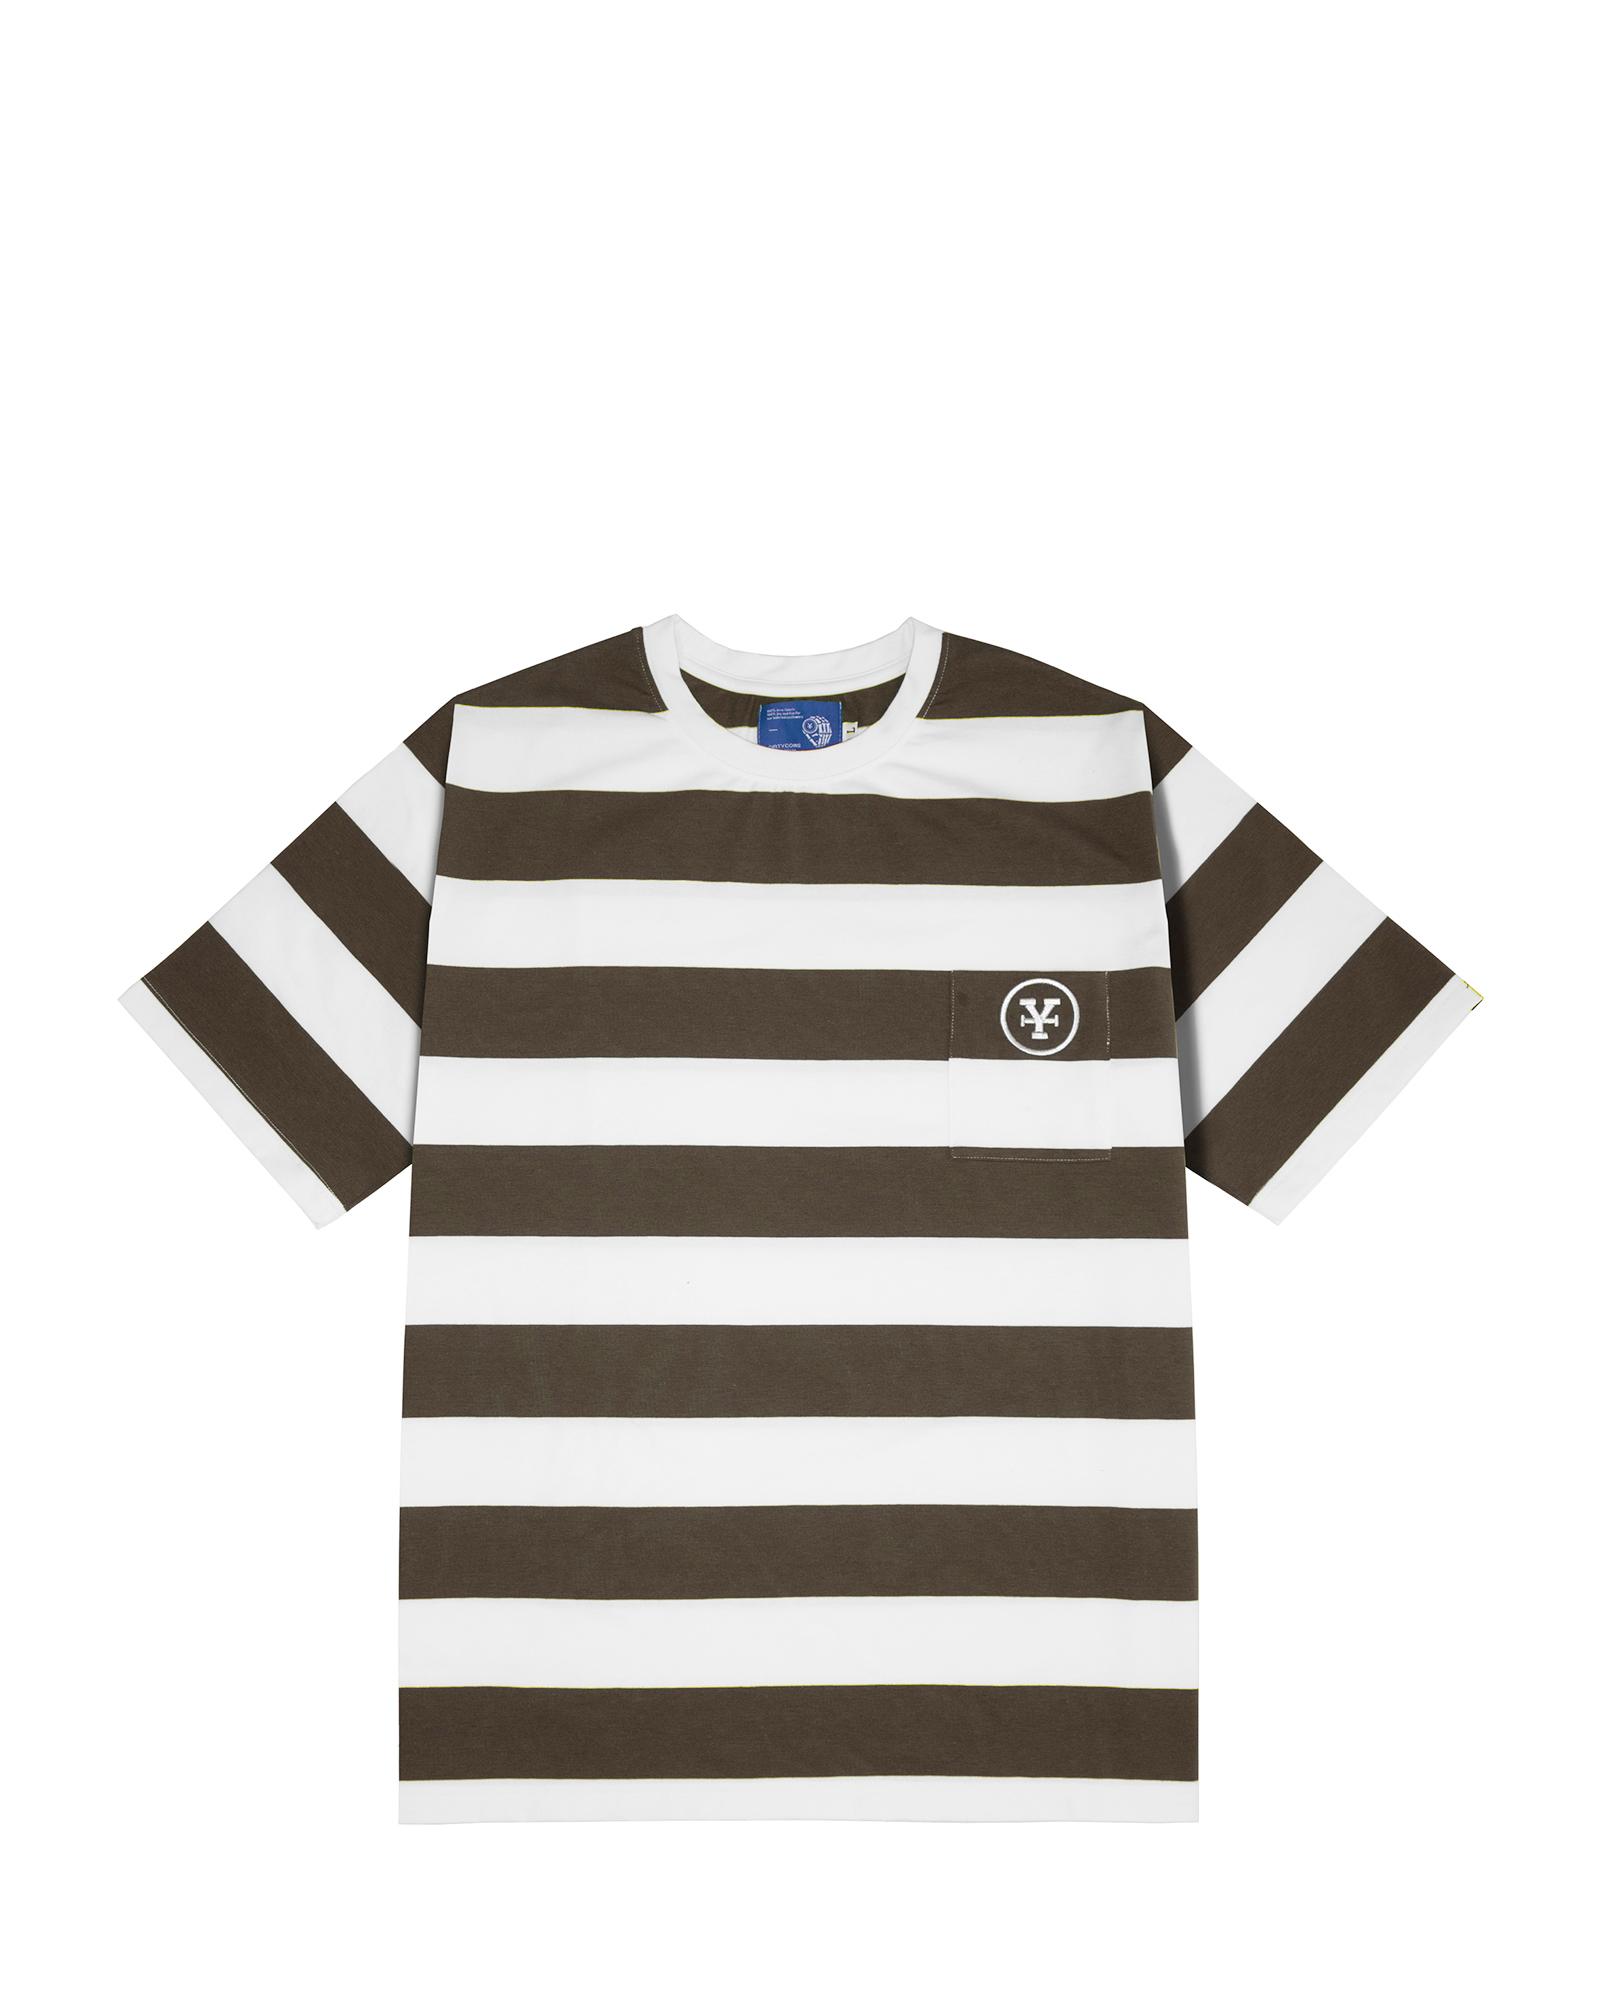 DirtyCoins Big Stripes T-shirt - Brown